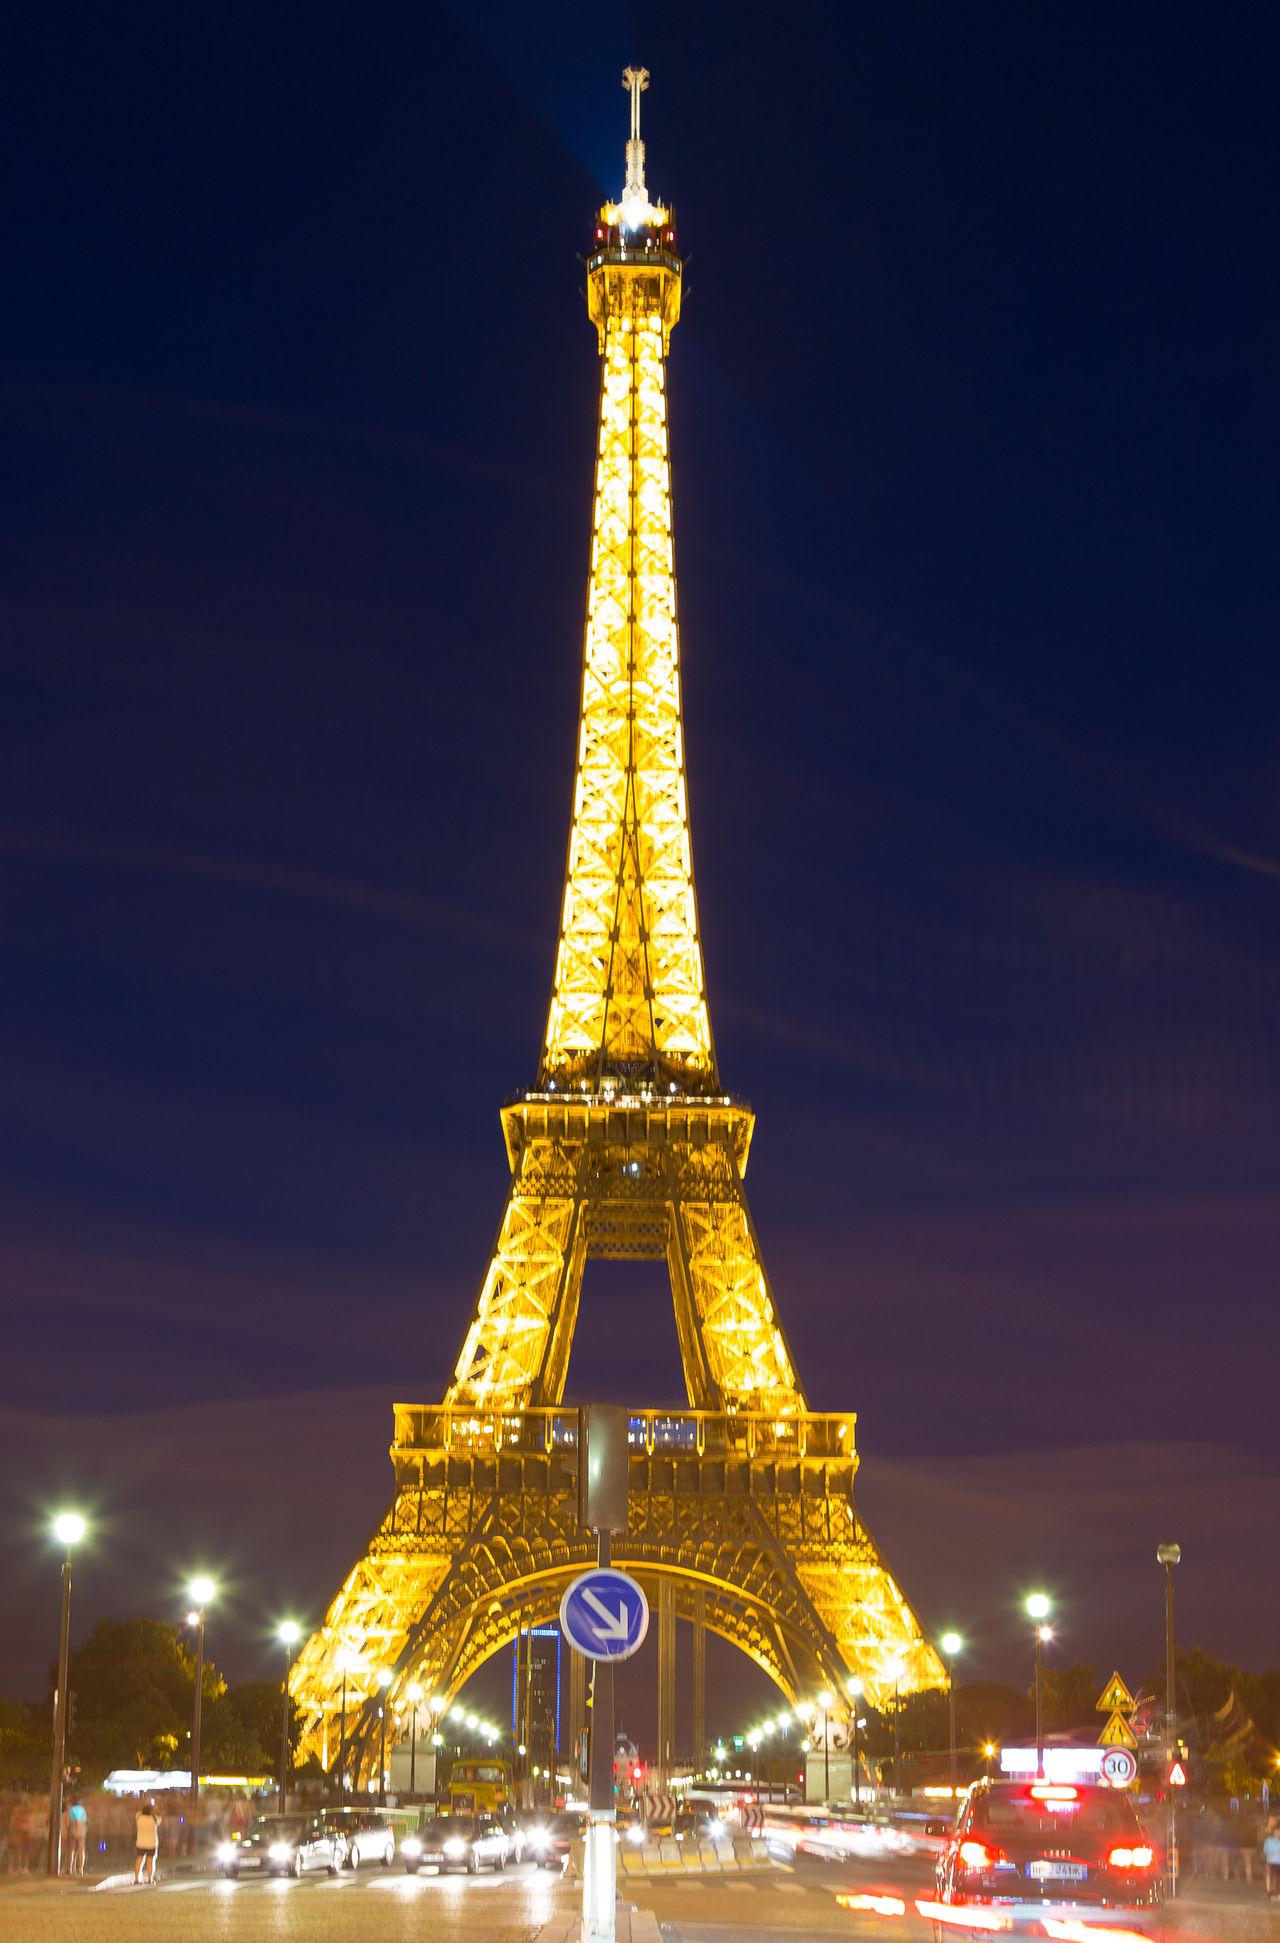 Architecture Atmosphere City Cityscape Cultures Eiffel Tower Eiffeltower Illuminated Lastlight Night Paris Street Tall - High Tower Travel Travel Destinations